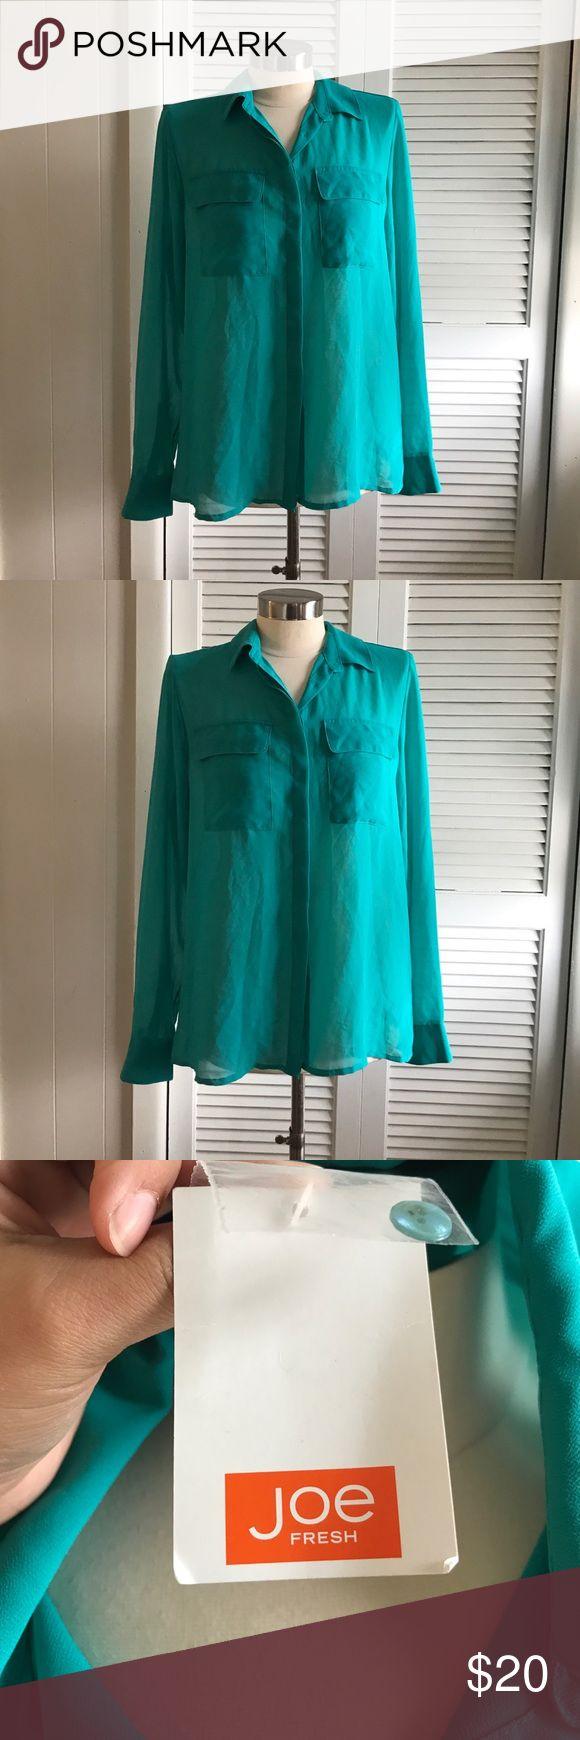 Joe fresh button down blouse Joe fresh button down blouse size medium brand new with tags Joe Fresh Tops Button Down Shirts